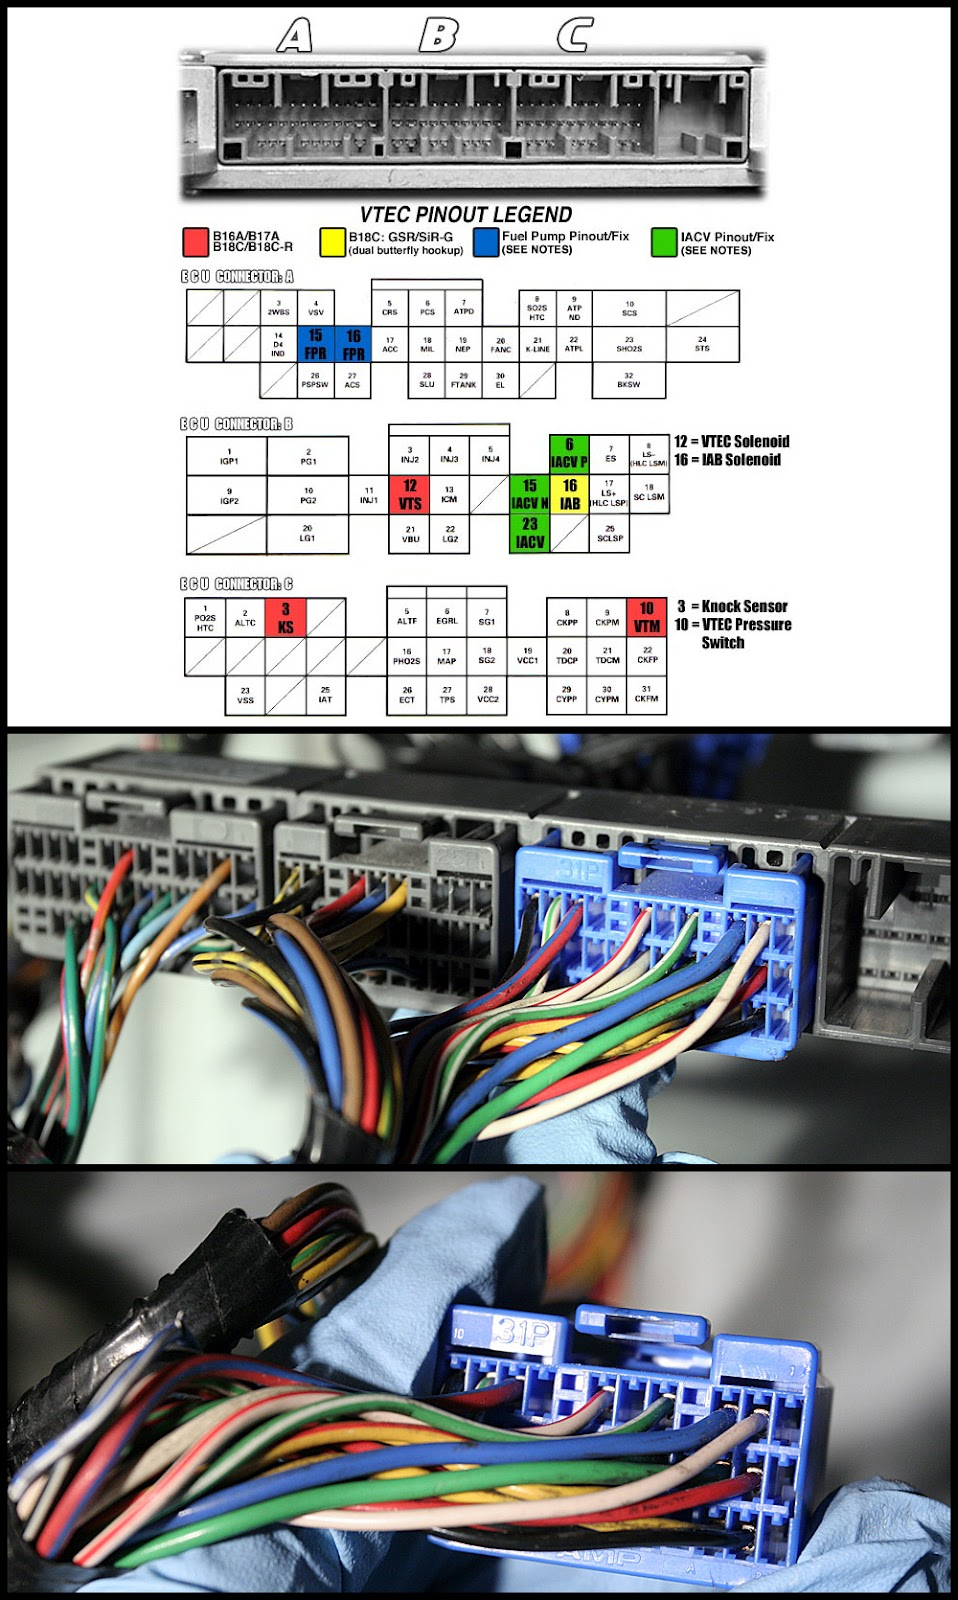 medium resolution of obd2 to obd1 wiring diagram wire management wiring diagram obd2 to obd1 wiring diagram